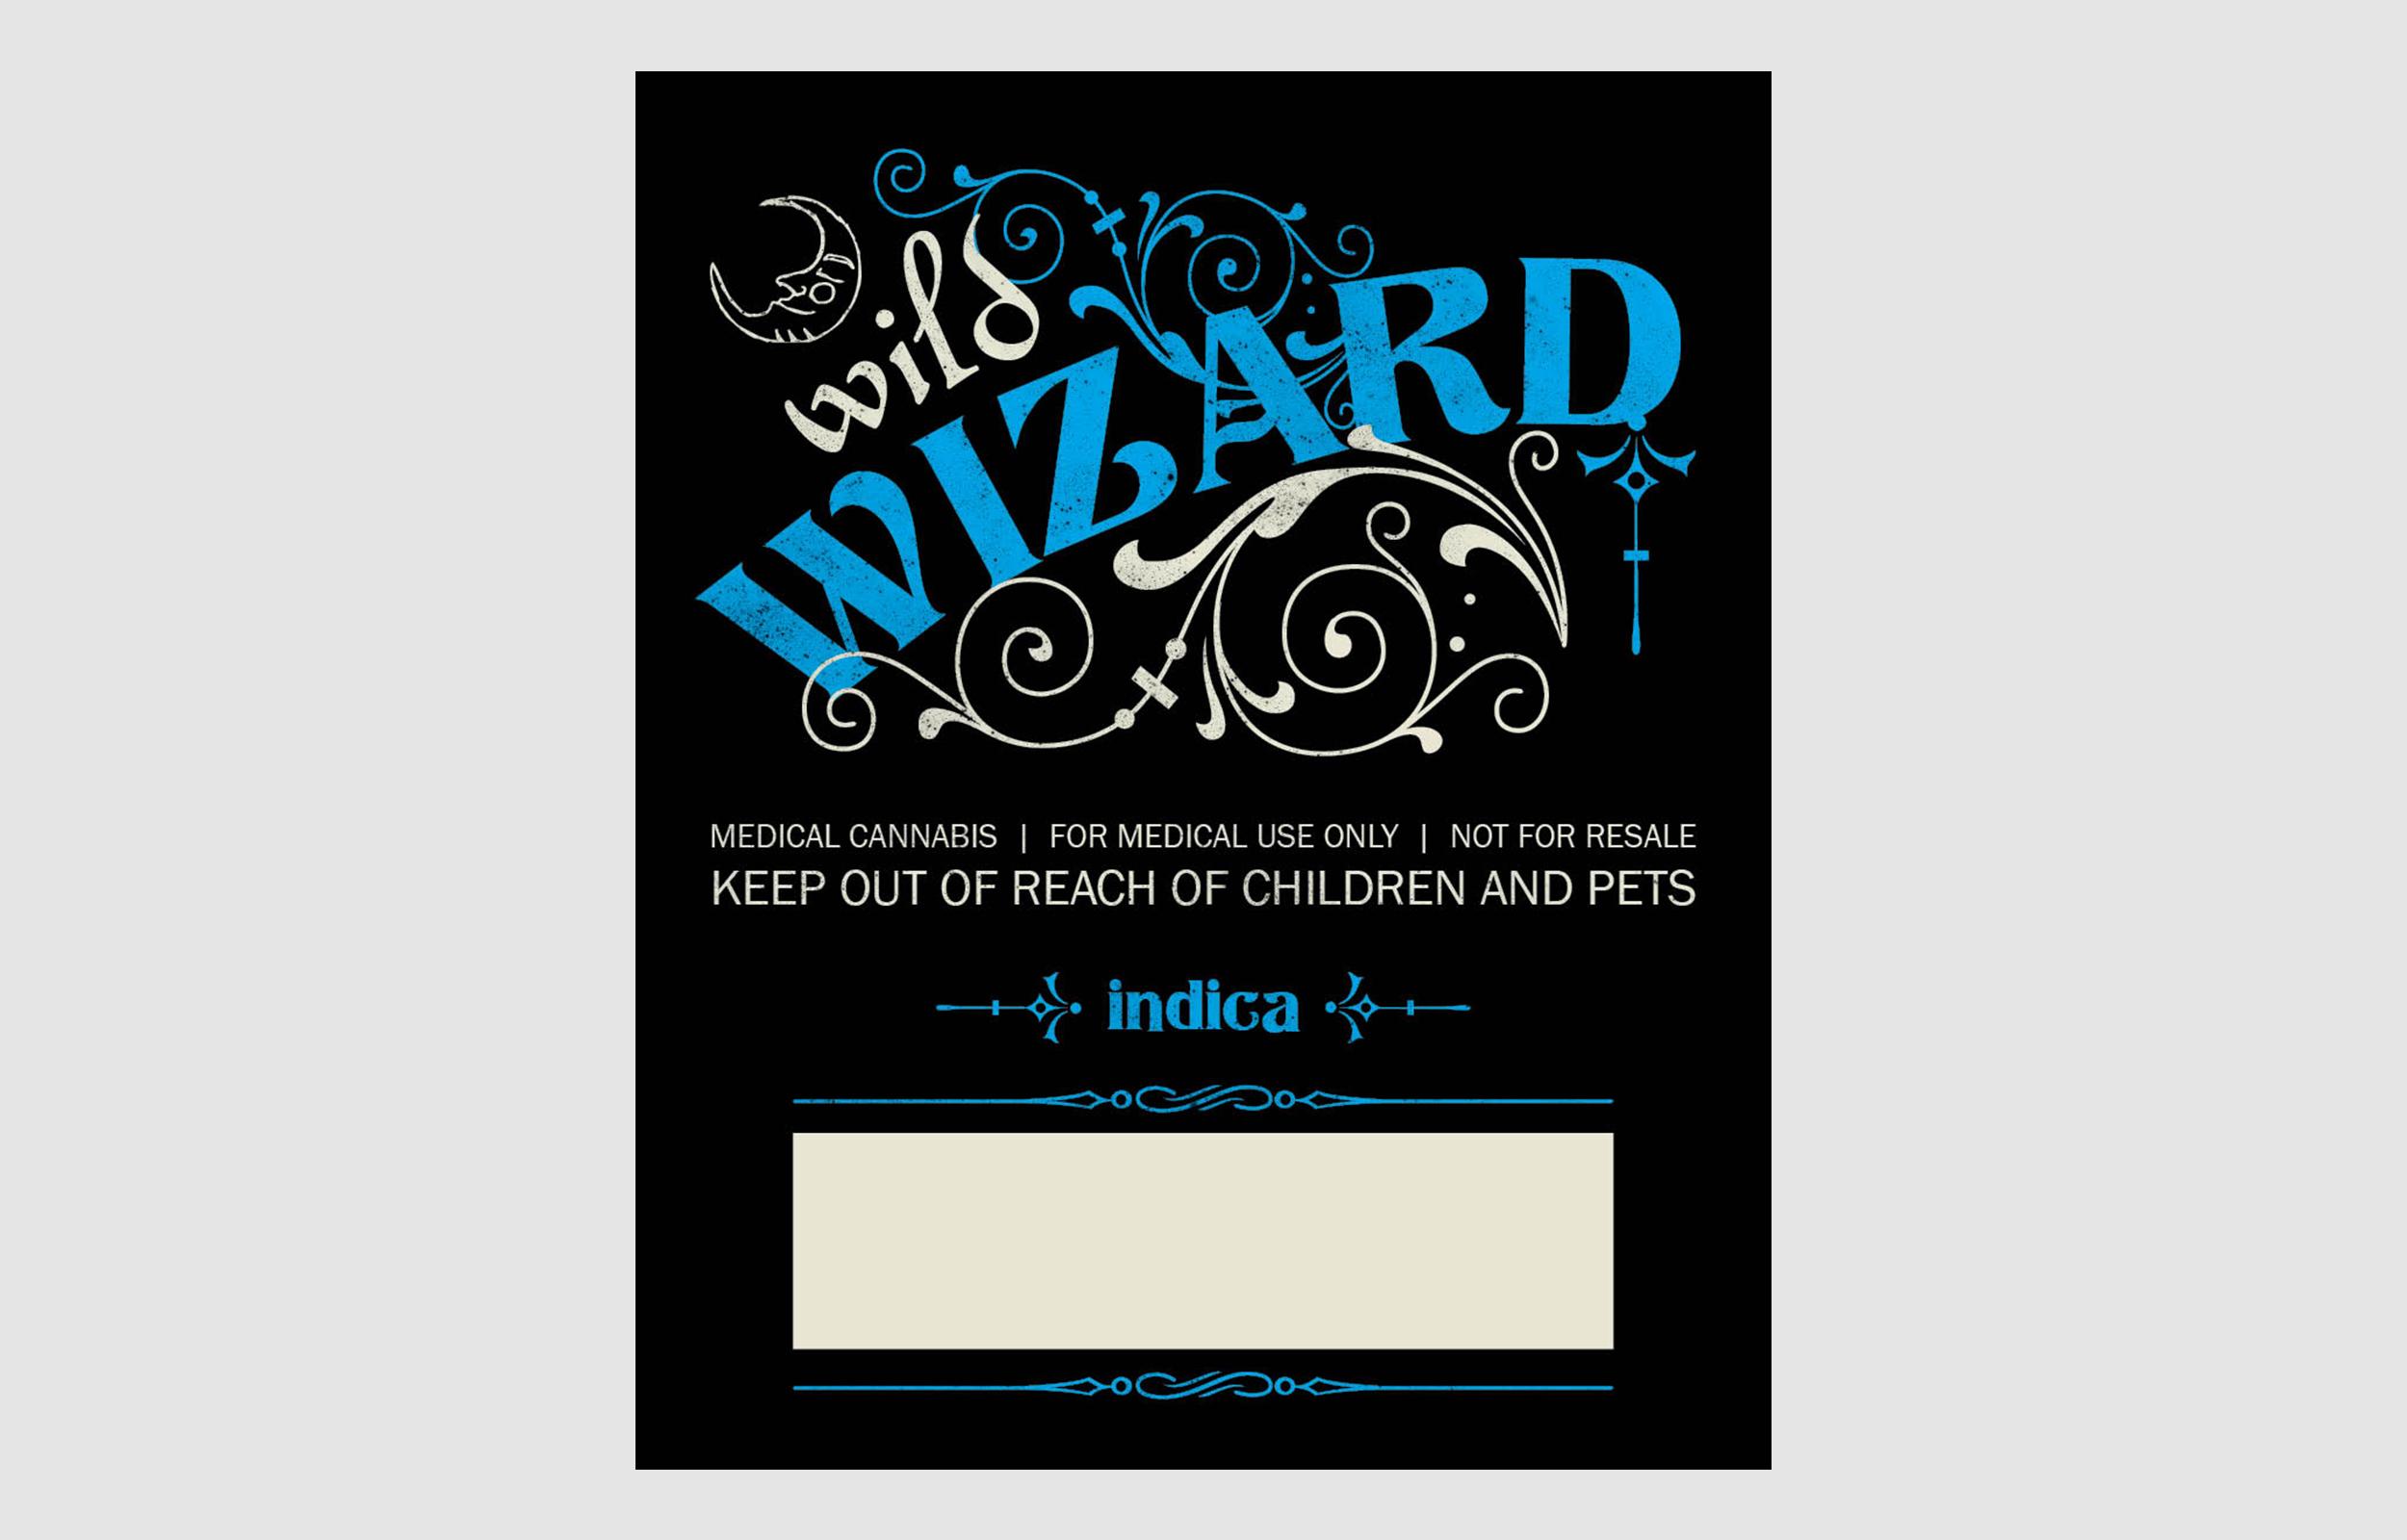 Wild Wizard Indica Label